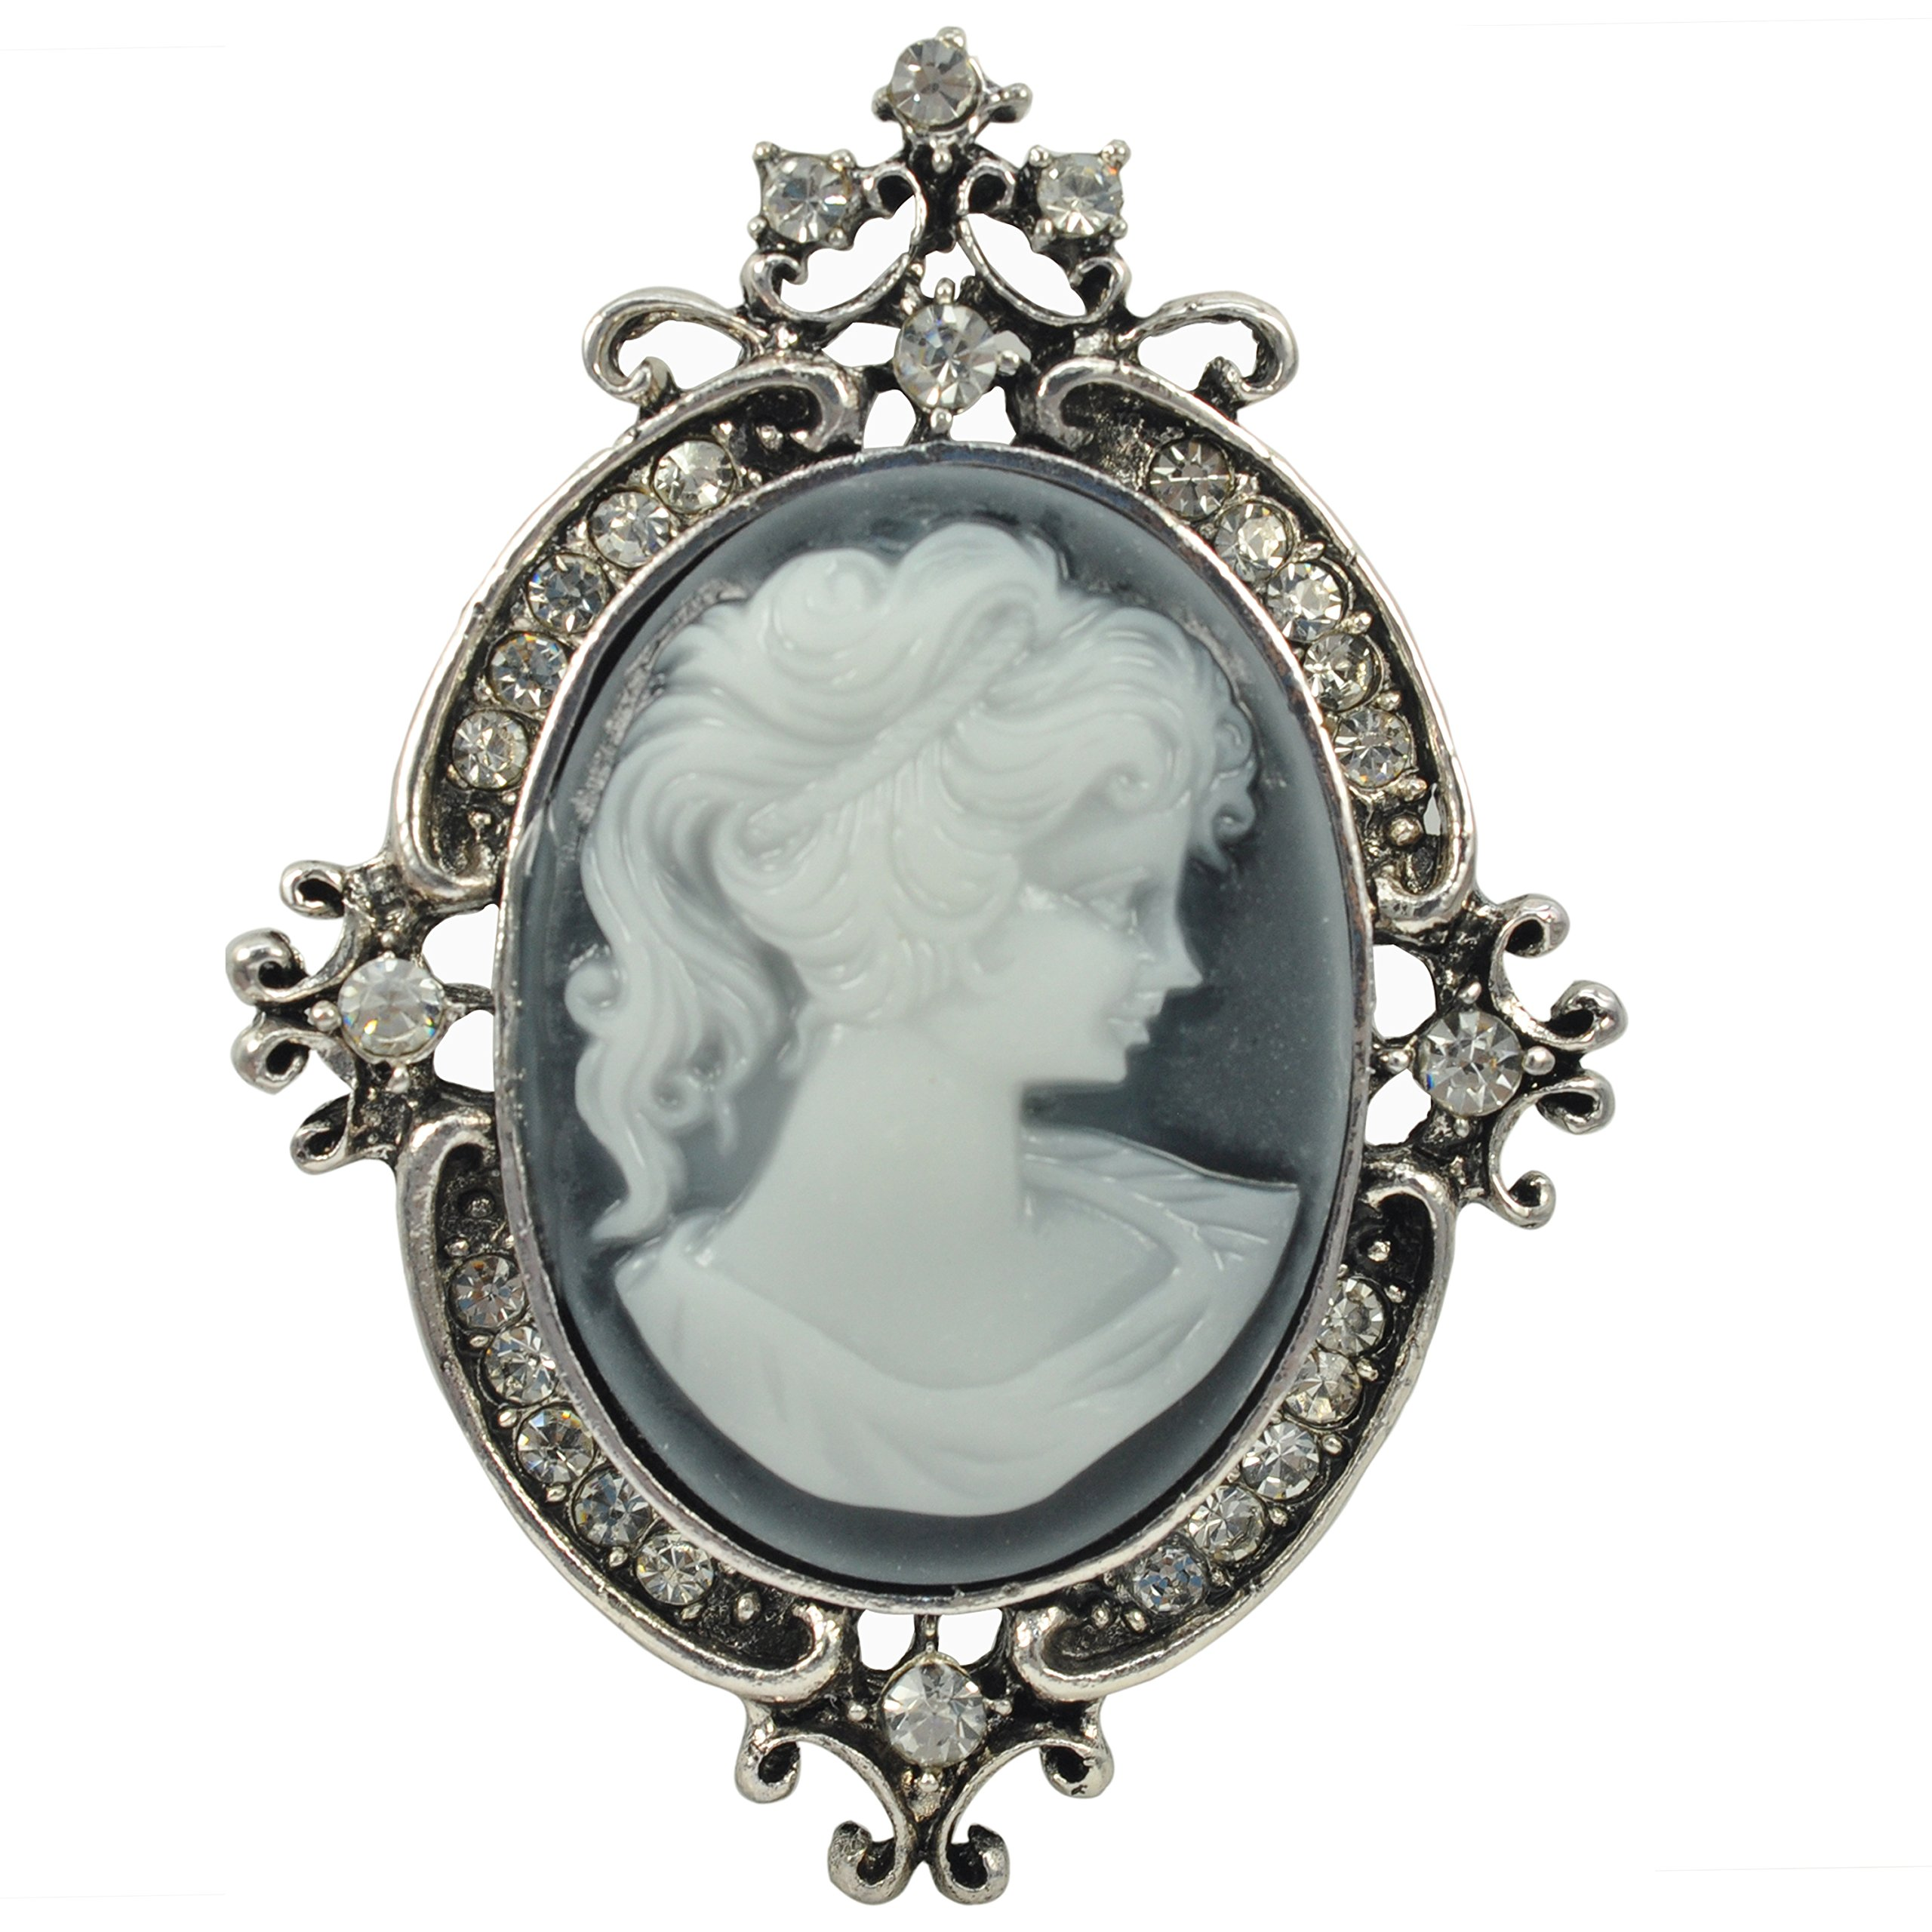 Gyn&Joy Vintage Style Cameo Victorian Lady Maiden Crystal Rhinestone Pin Brooch BZ037 (old silver)